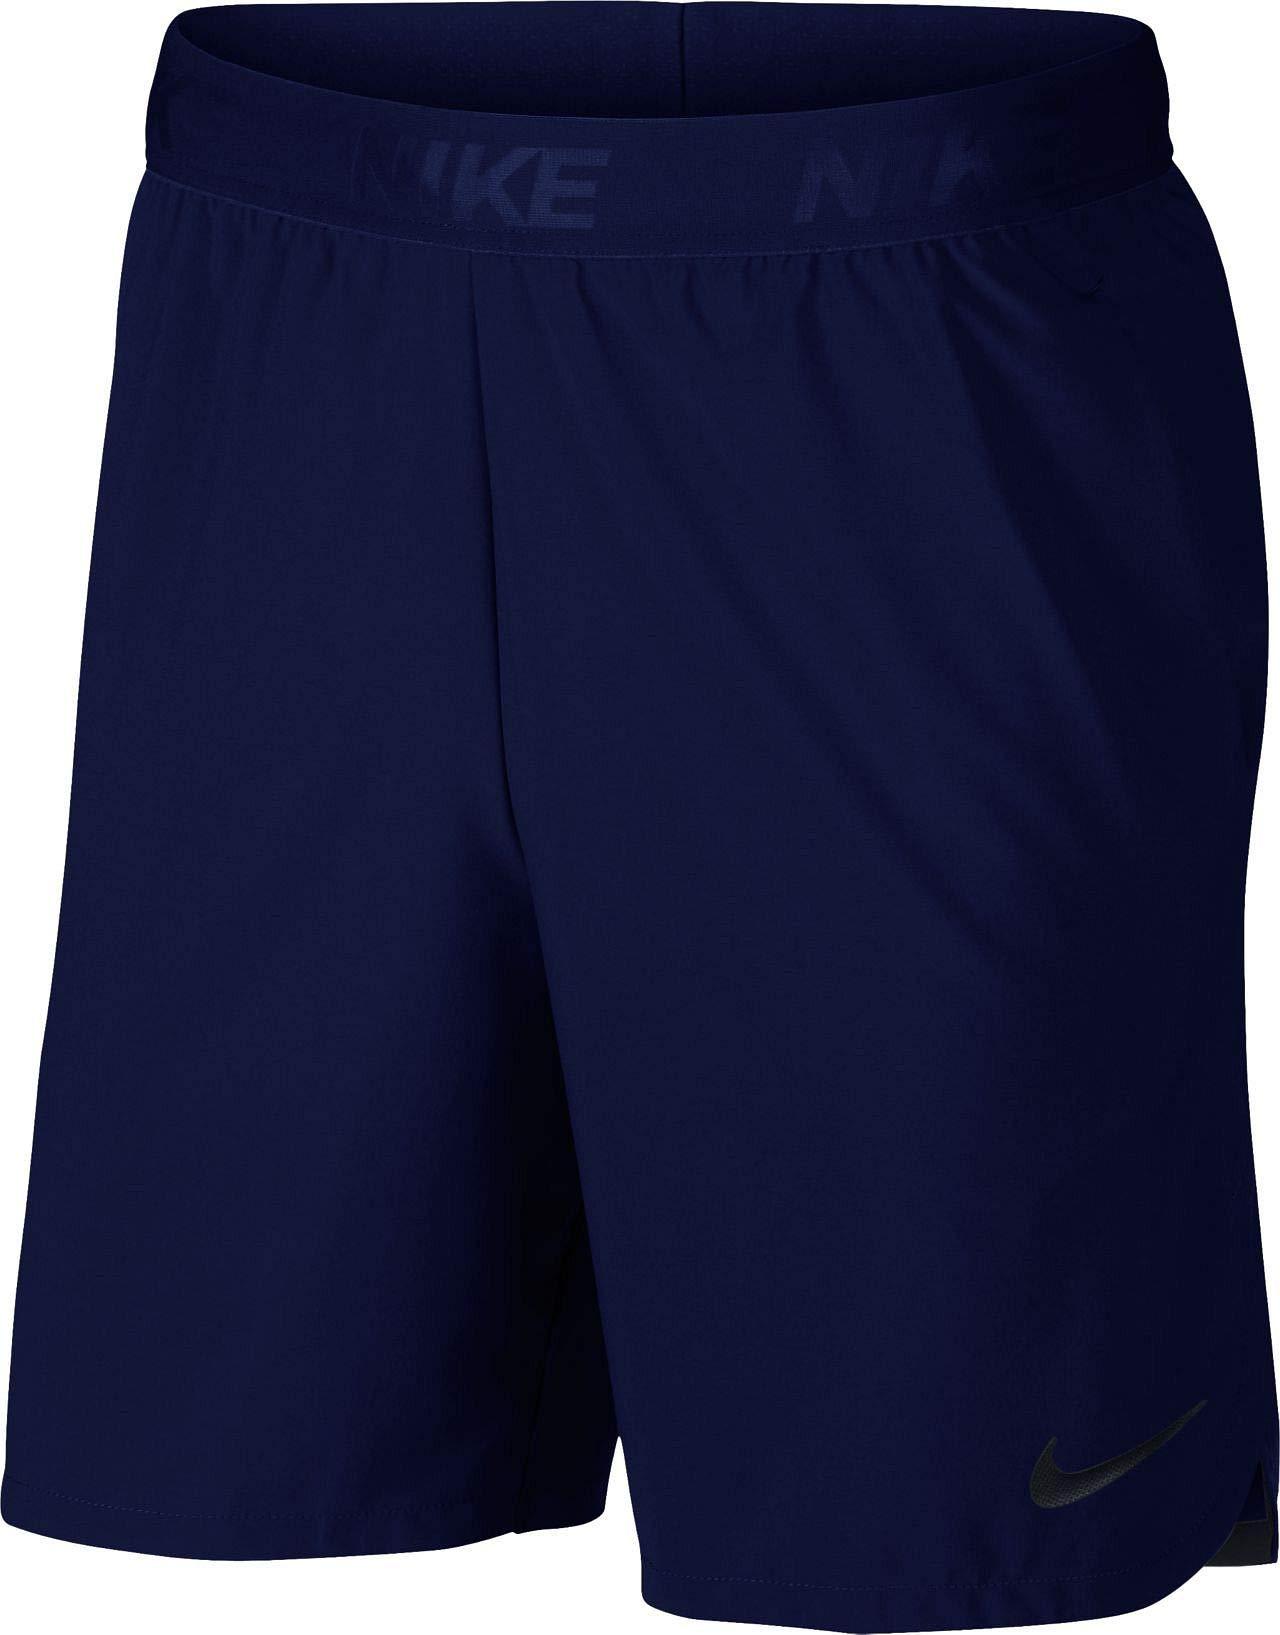 Nike Flex Men's 8'' Training Shorts